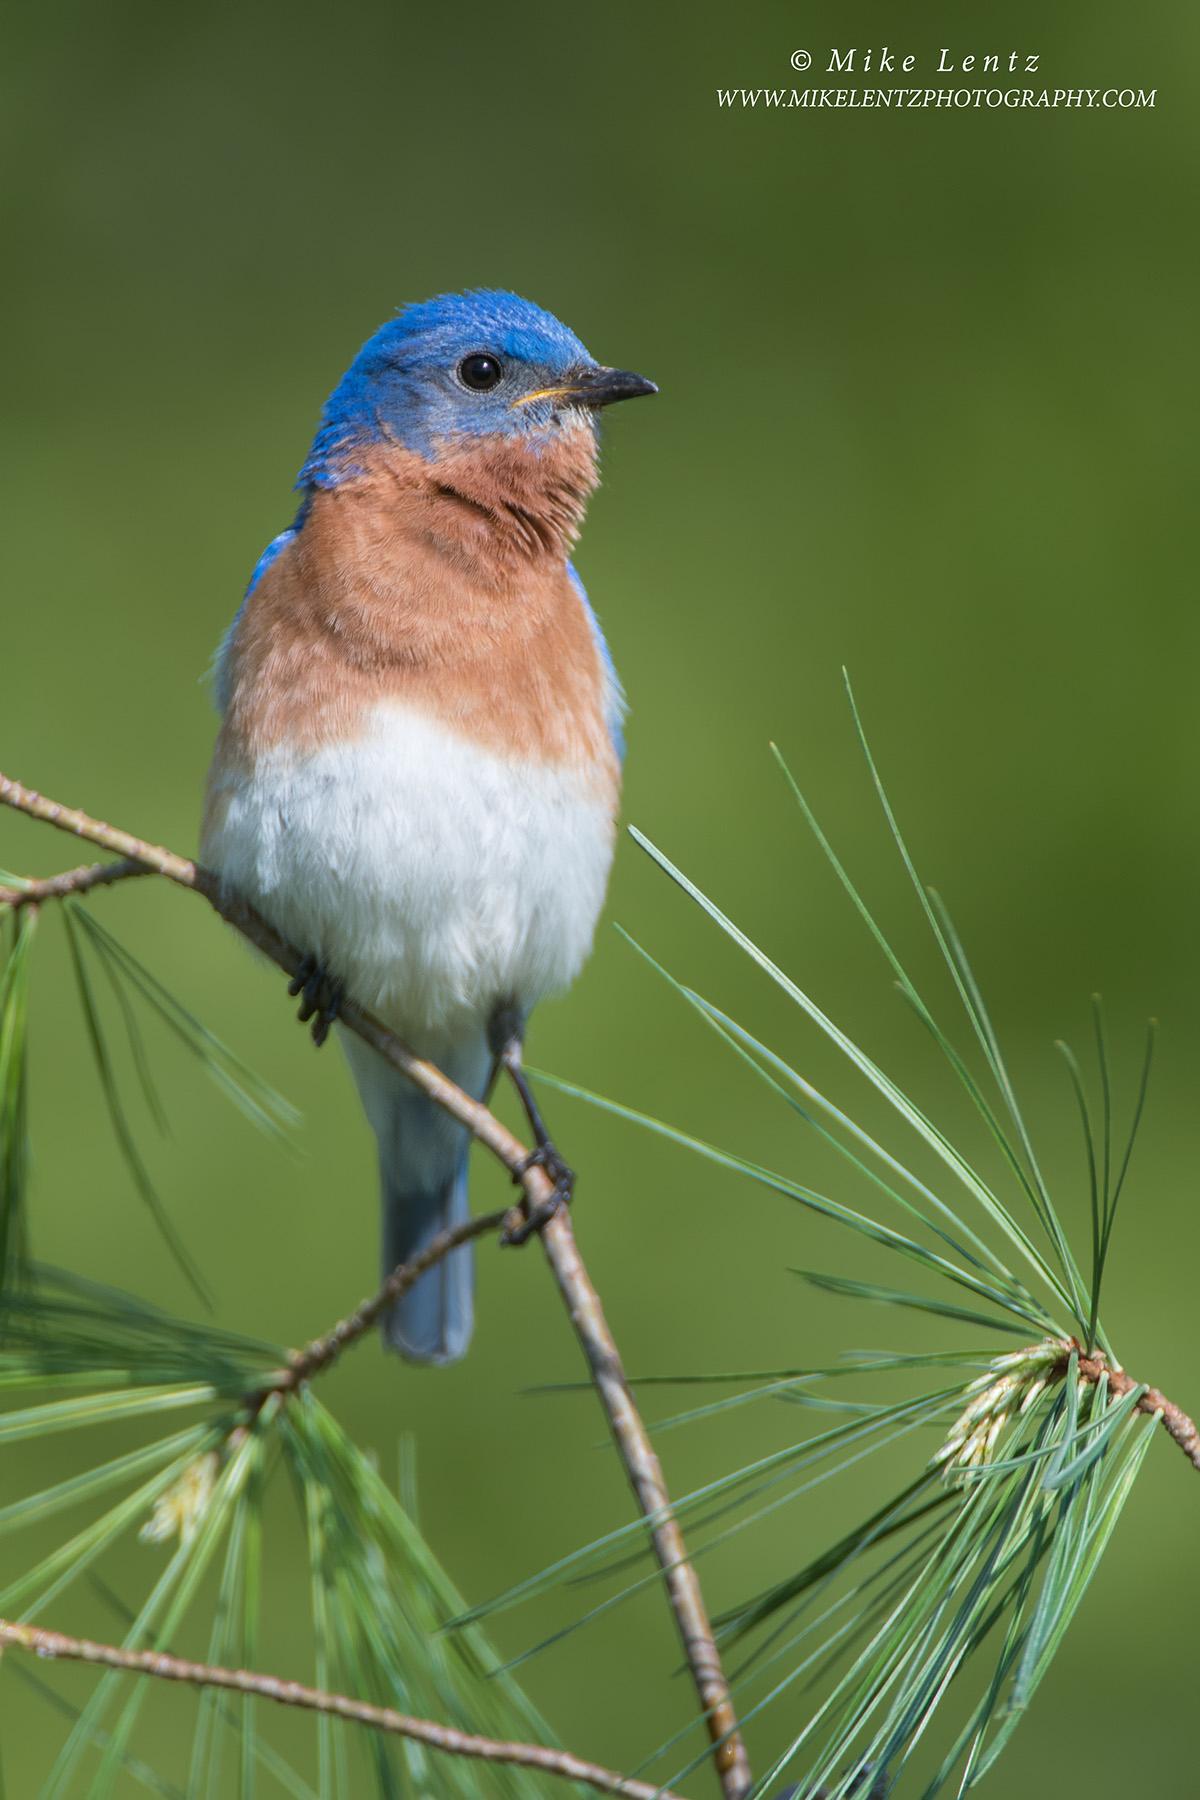 Bluebird verticle on white pinesPS2